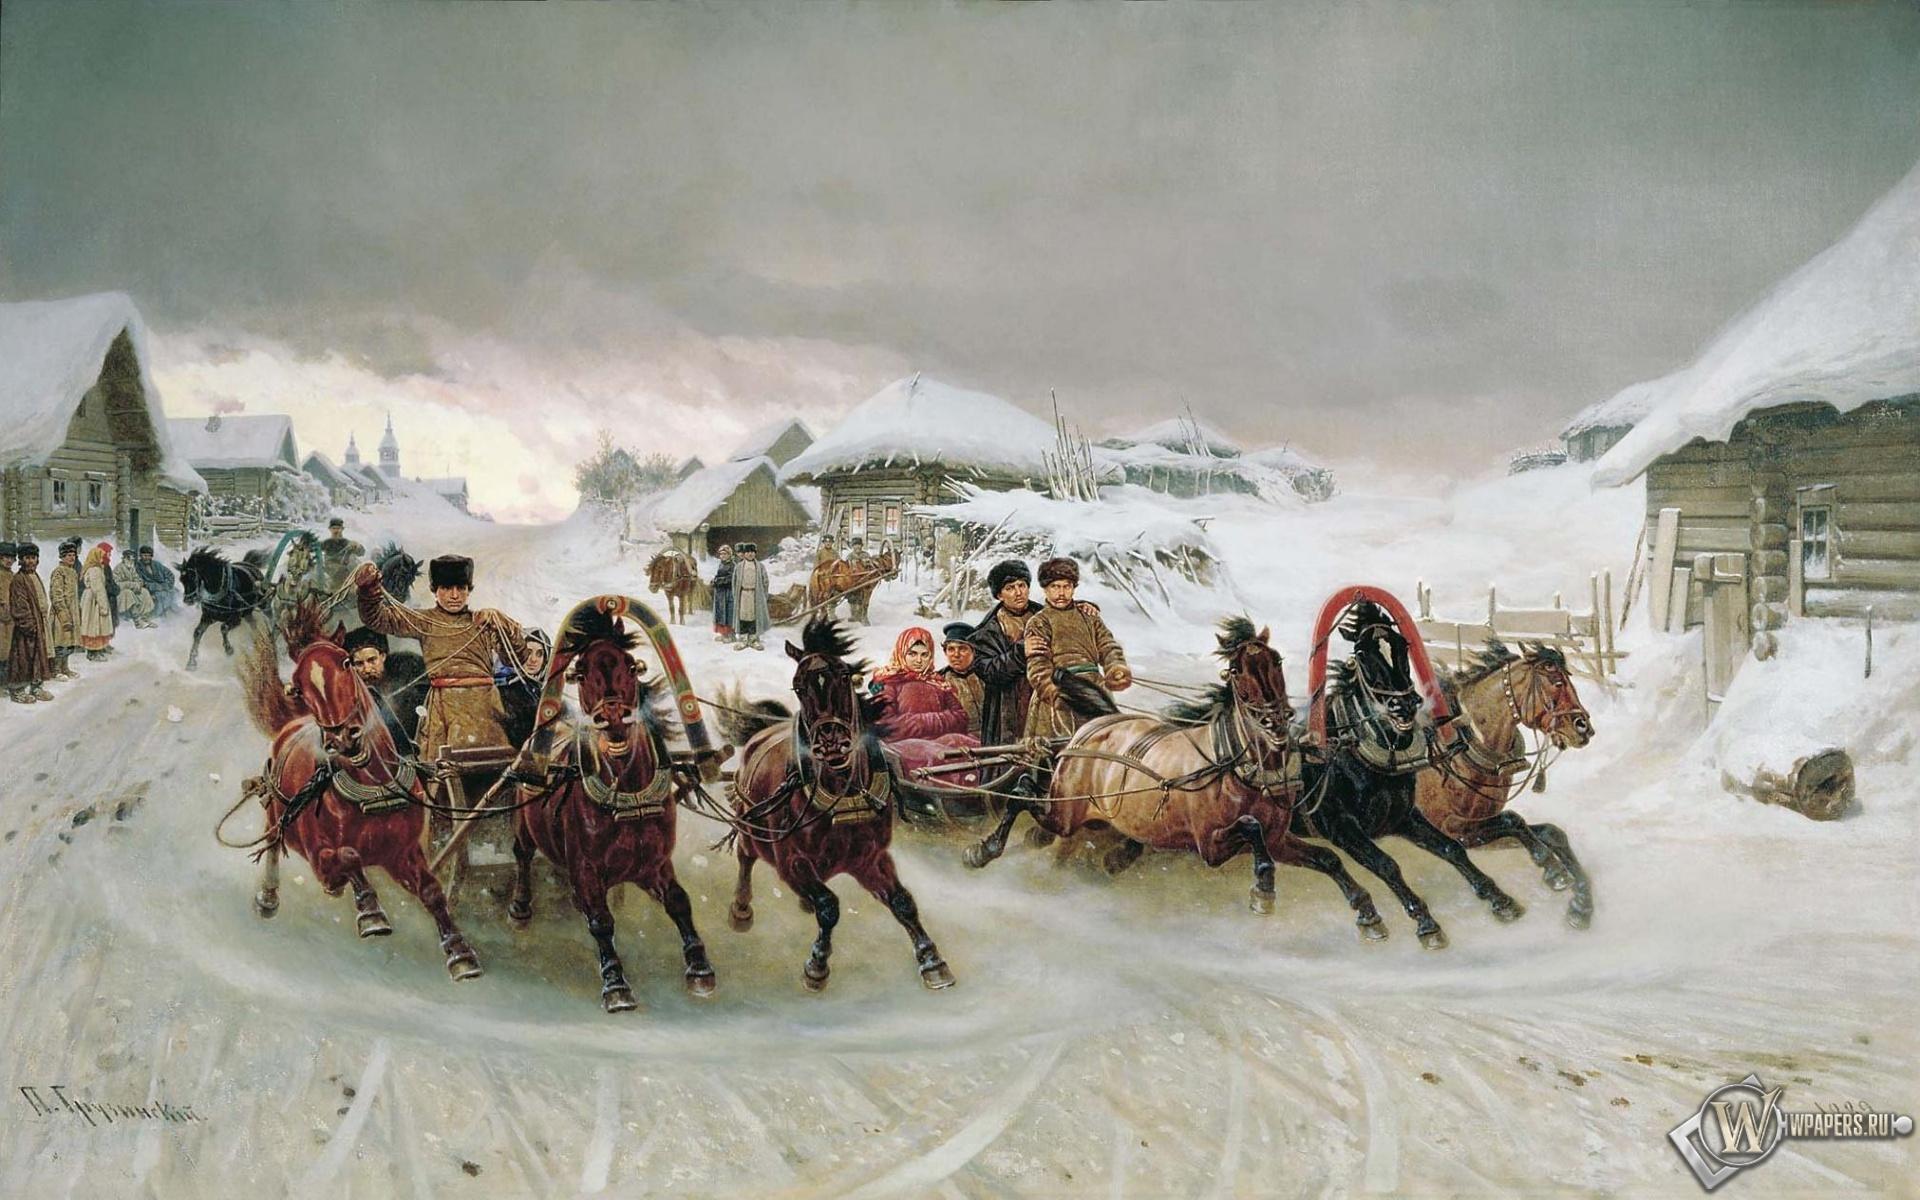 Картинки на рабочий стол 1920 1200 зима